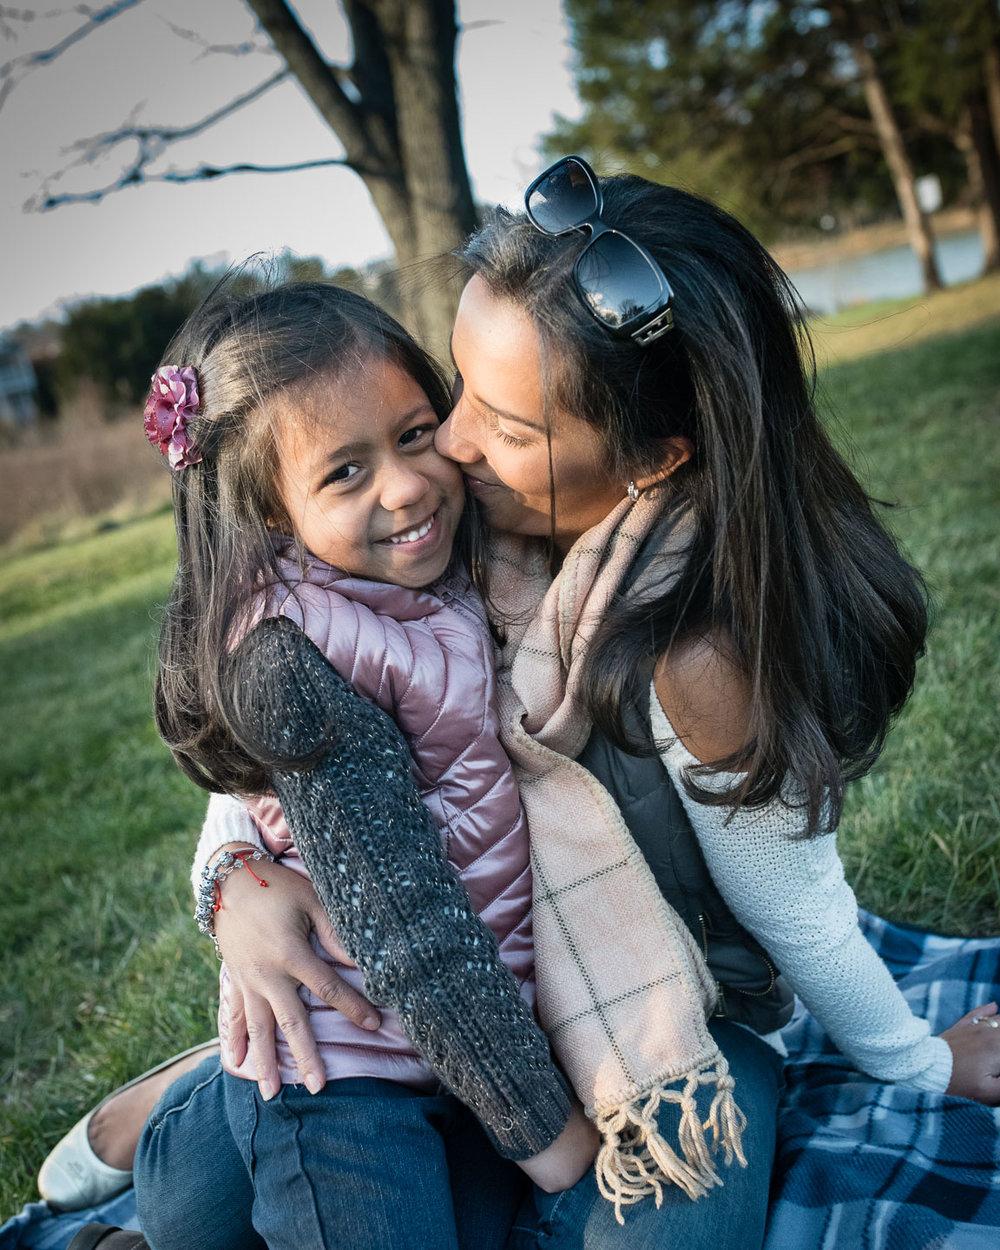 Photographer_Macarena_Janninck_Children_Family_headshots_Commercial-96.jpg